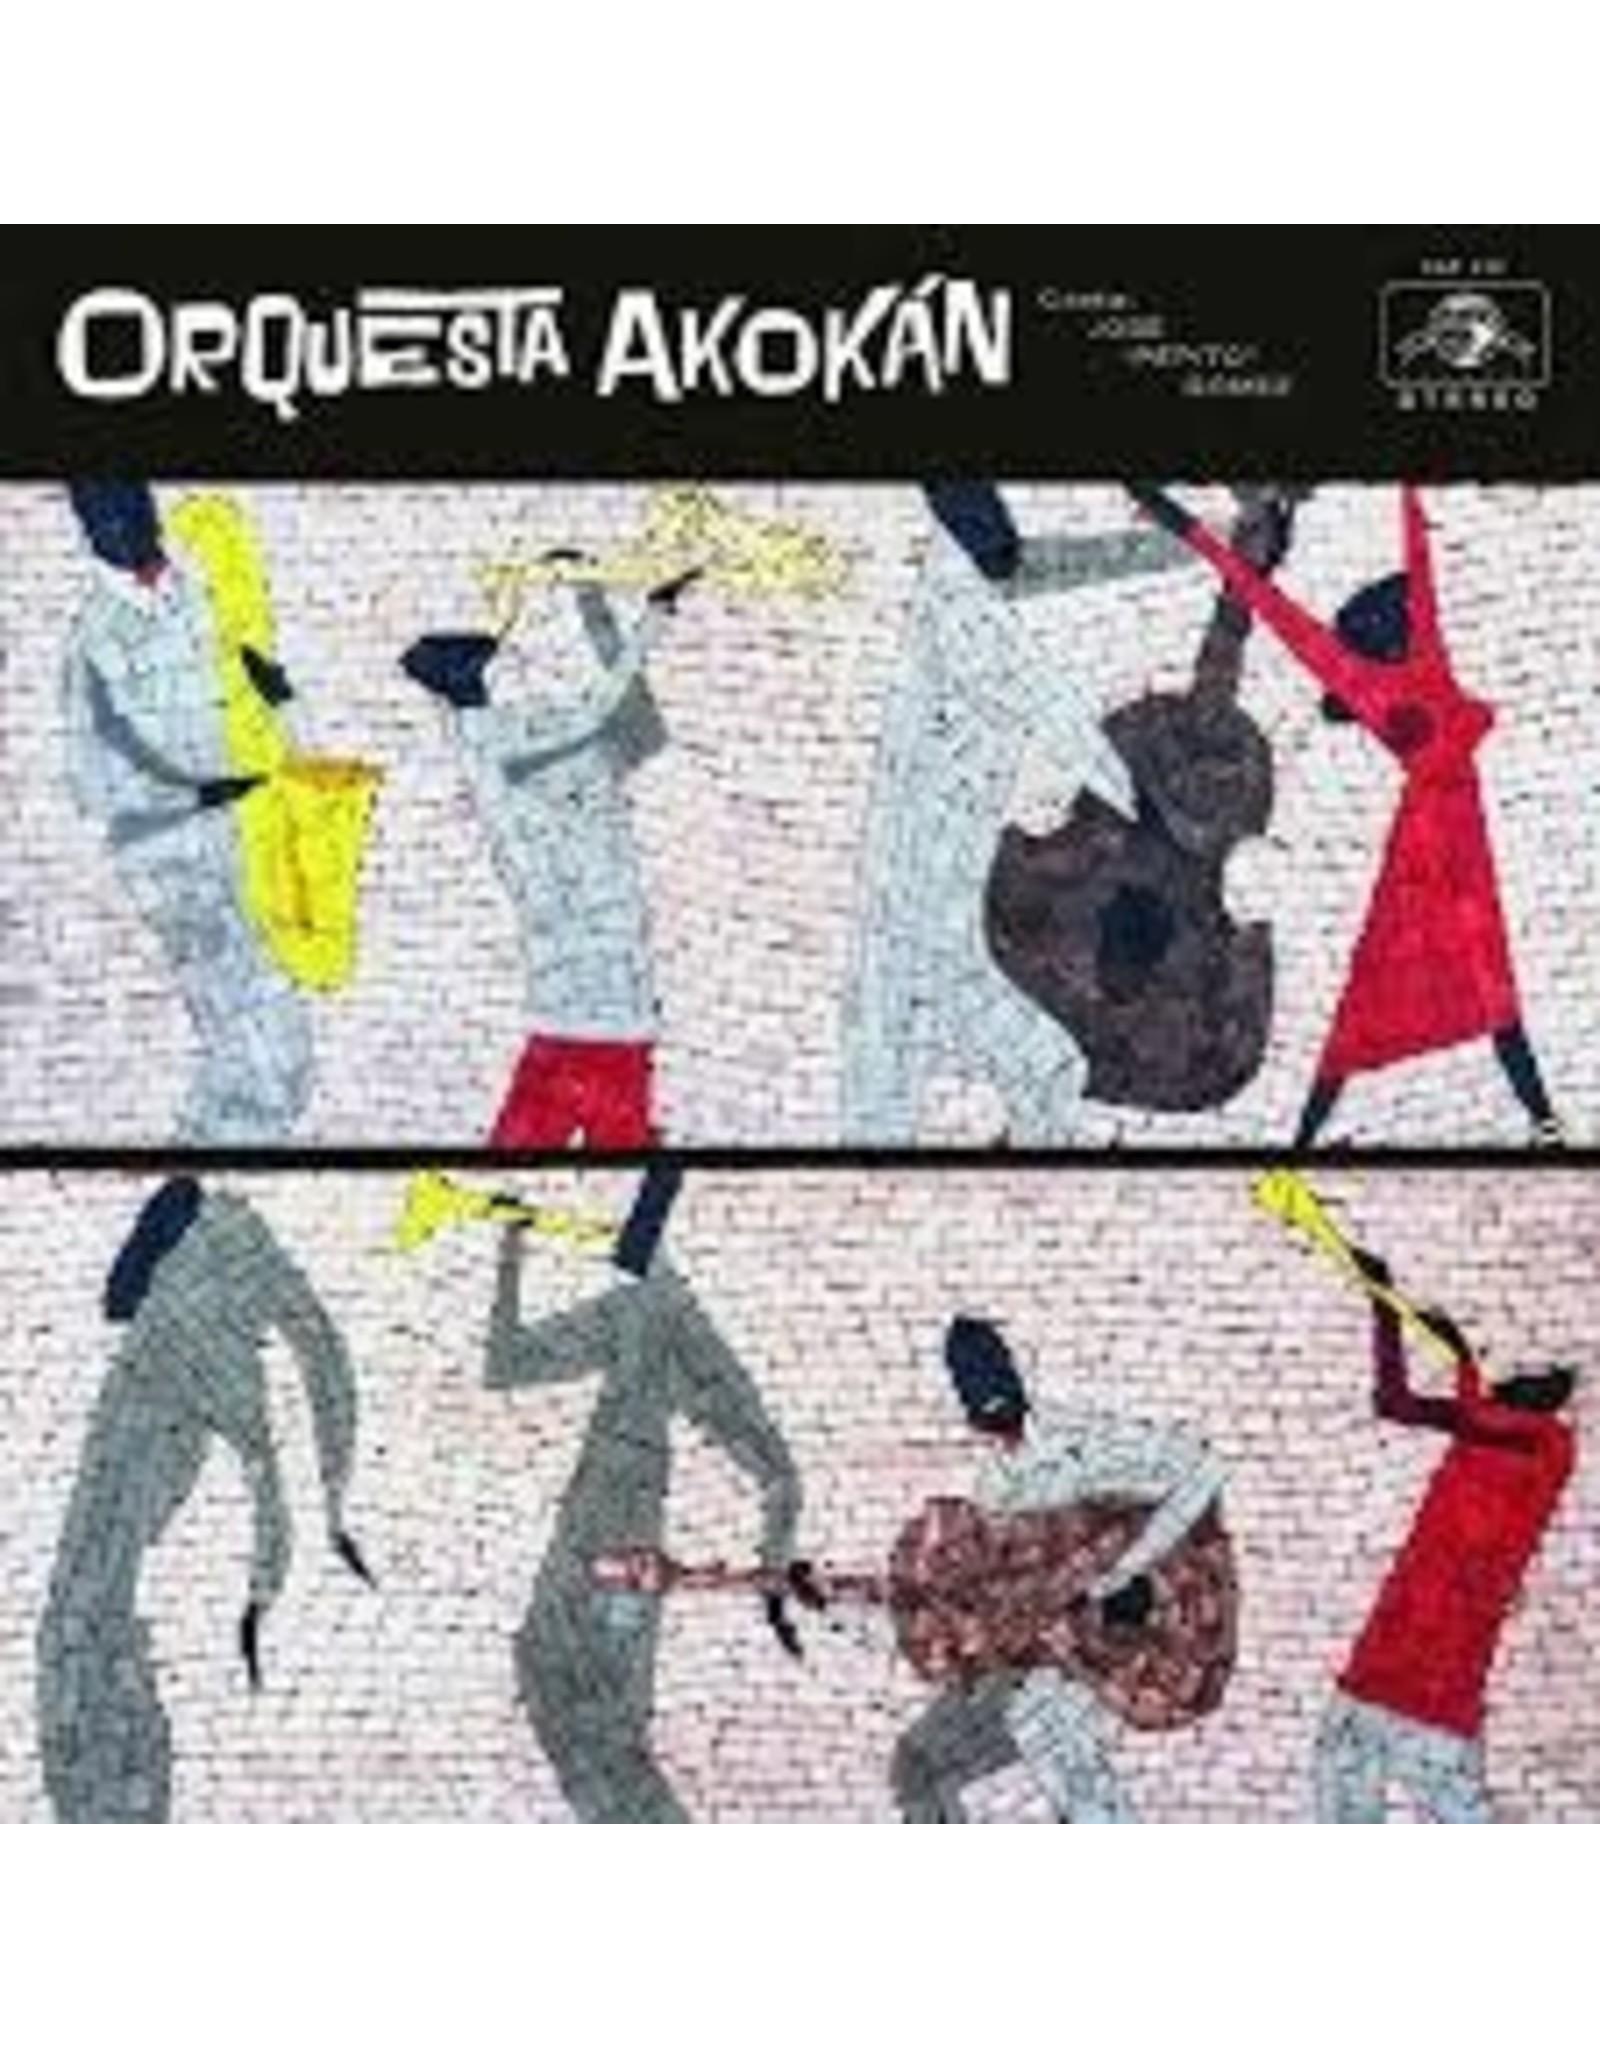 Daptone ORQUESTA AKOKAN: Orquesta Akokan LP